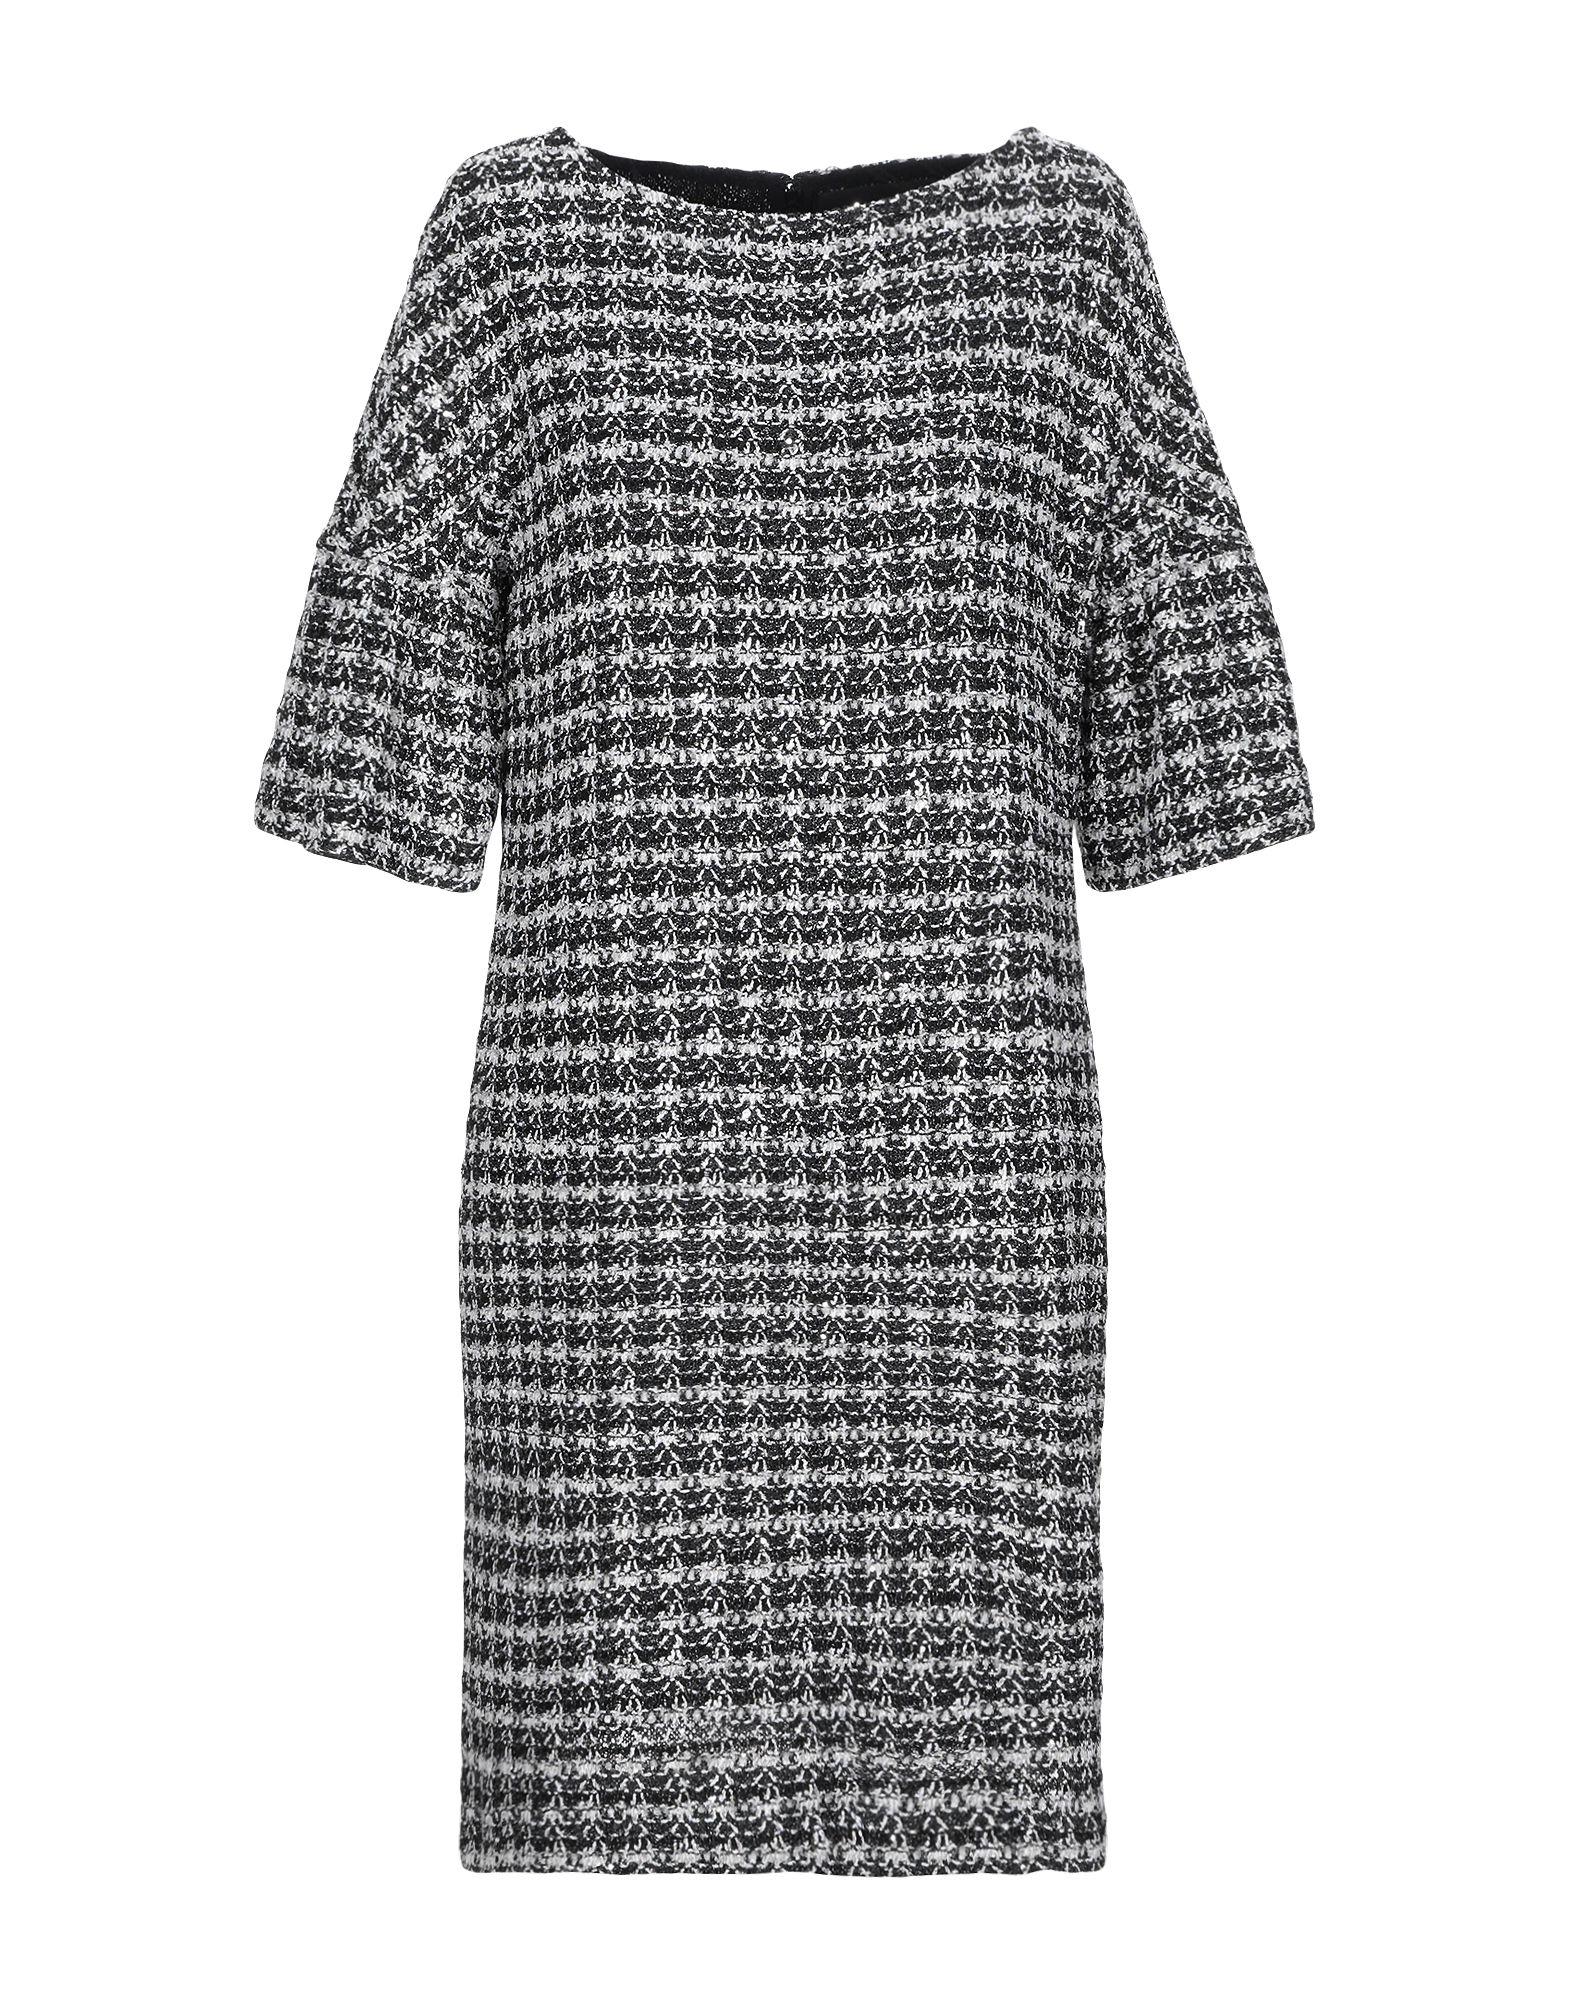 ST. JOHN COUTURE Короткое платье